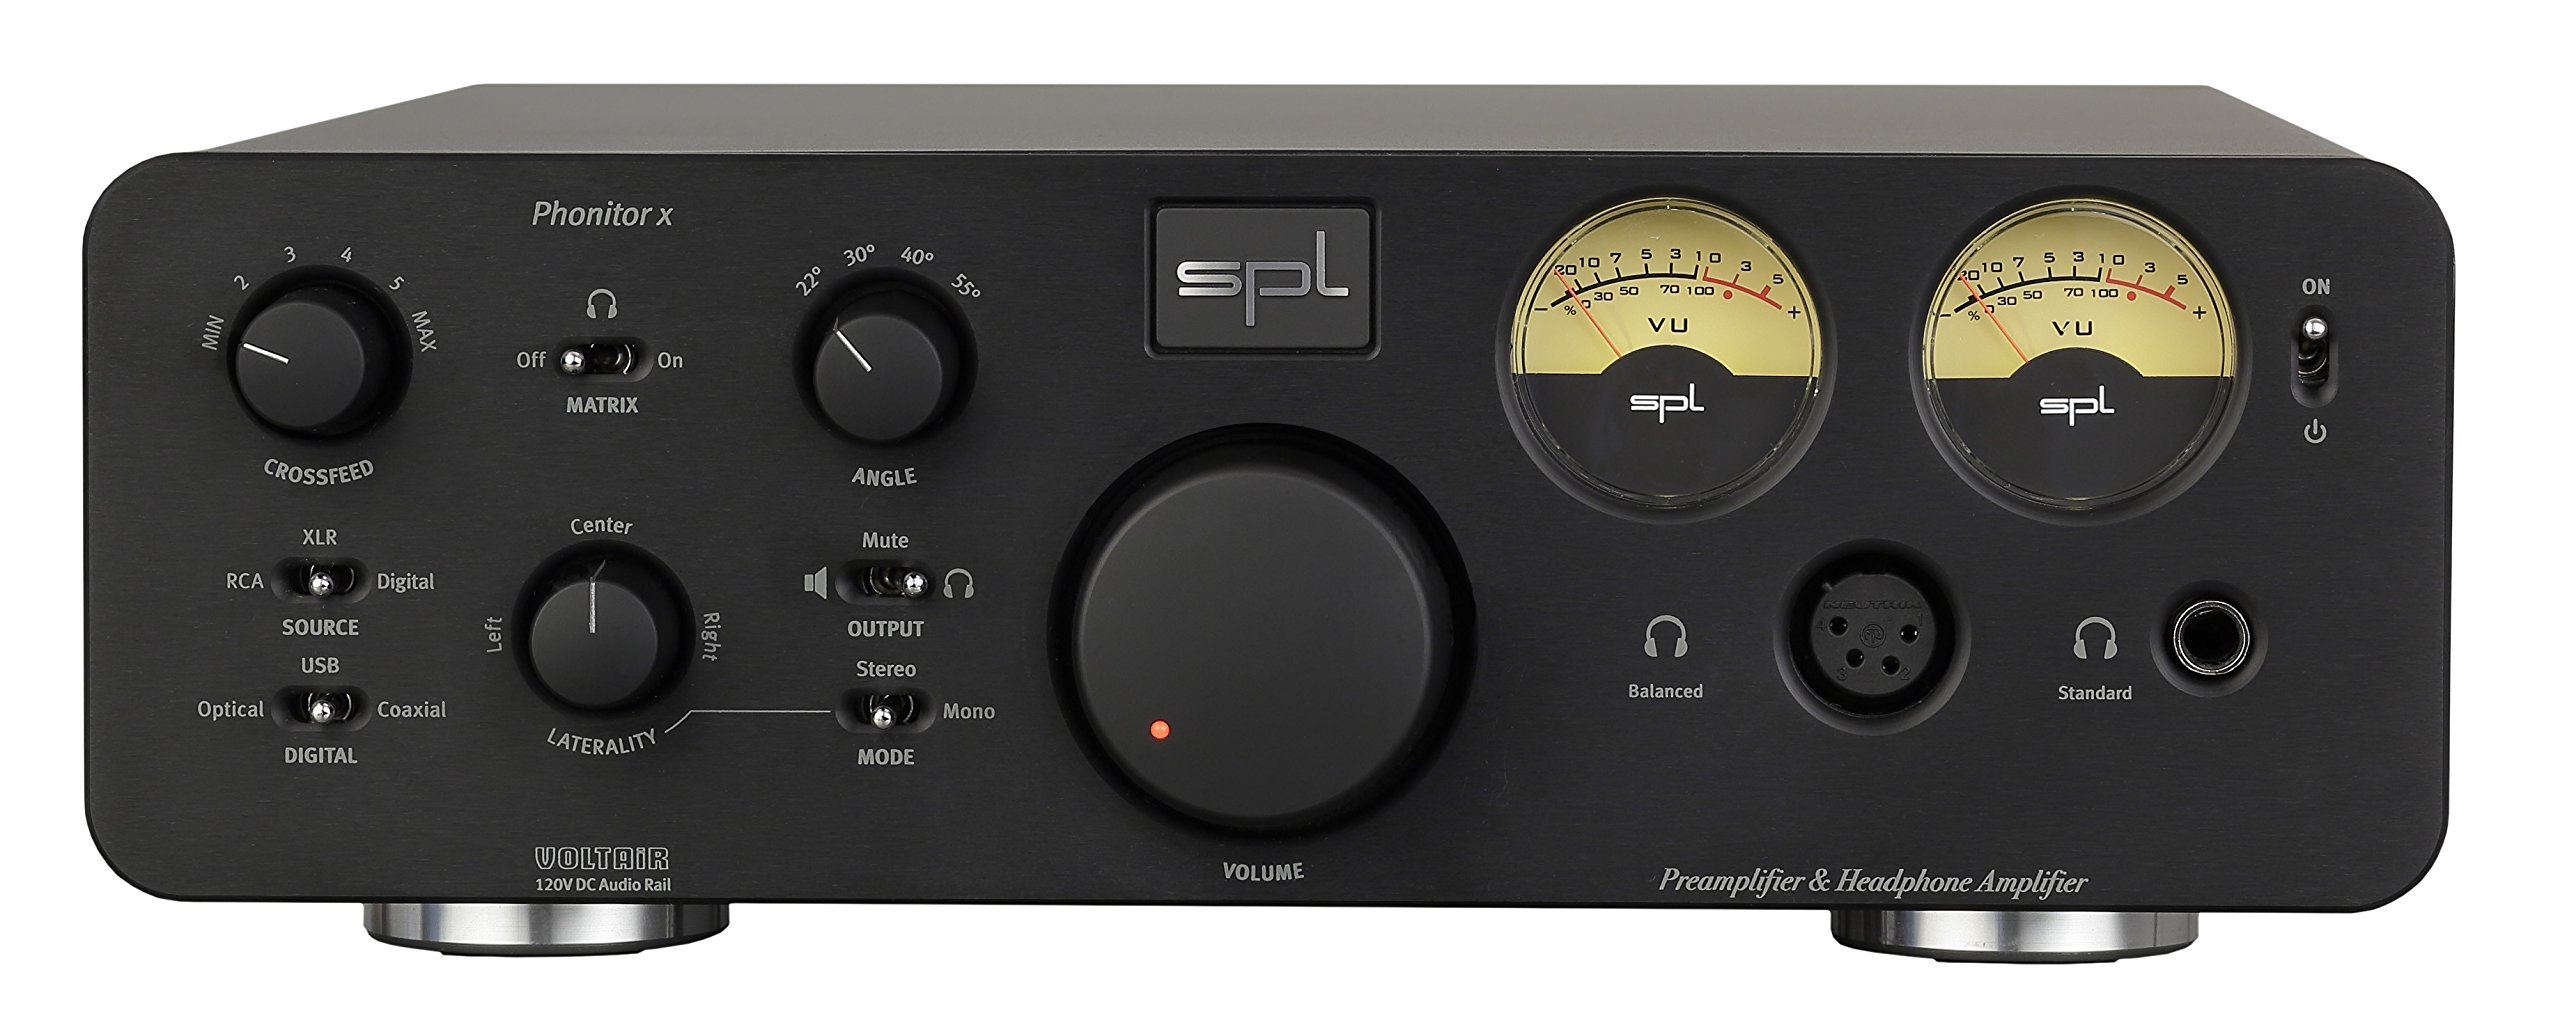 SPL Phonitor x balanced Headphone Amp/Preamp with 24bit/192 DAC (Black)